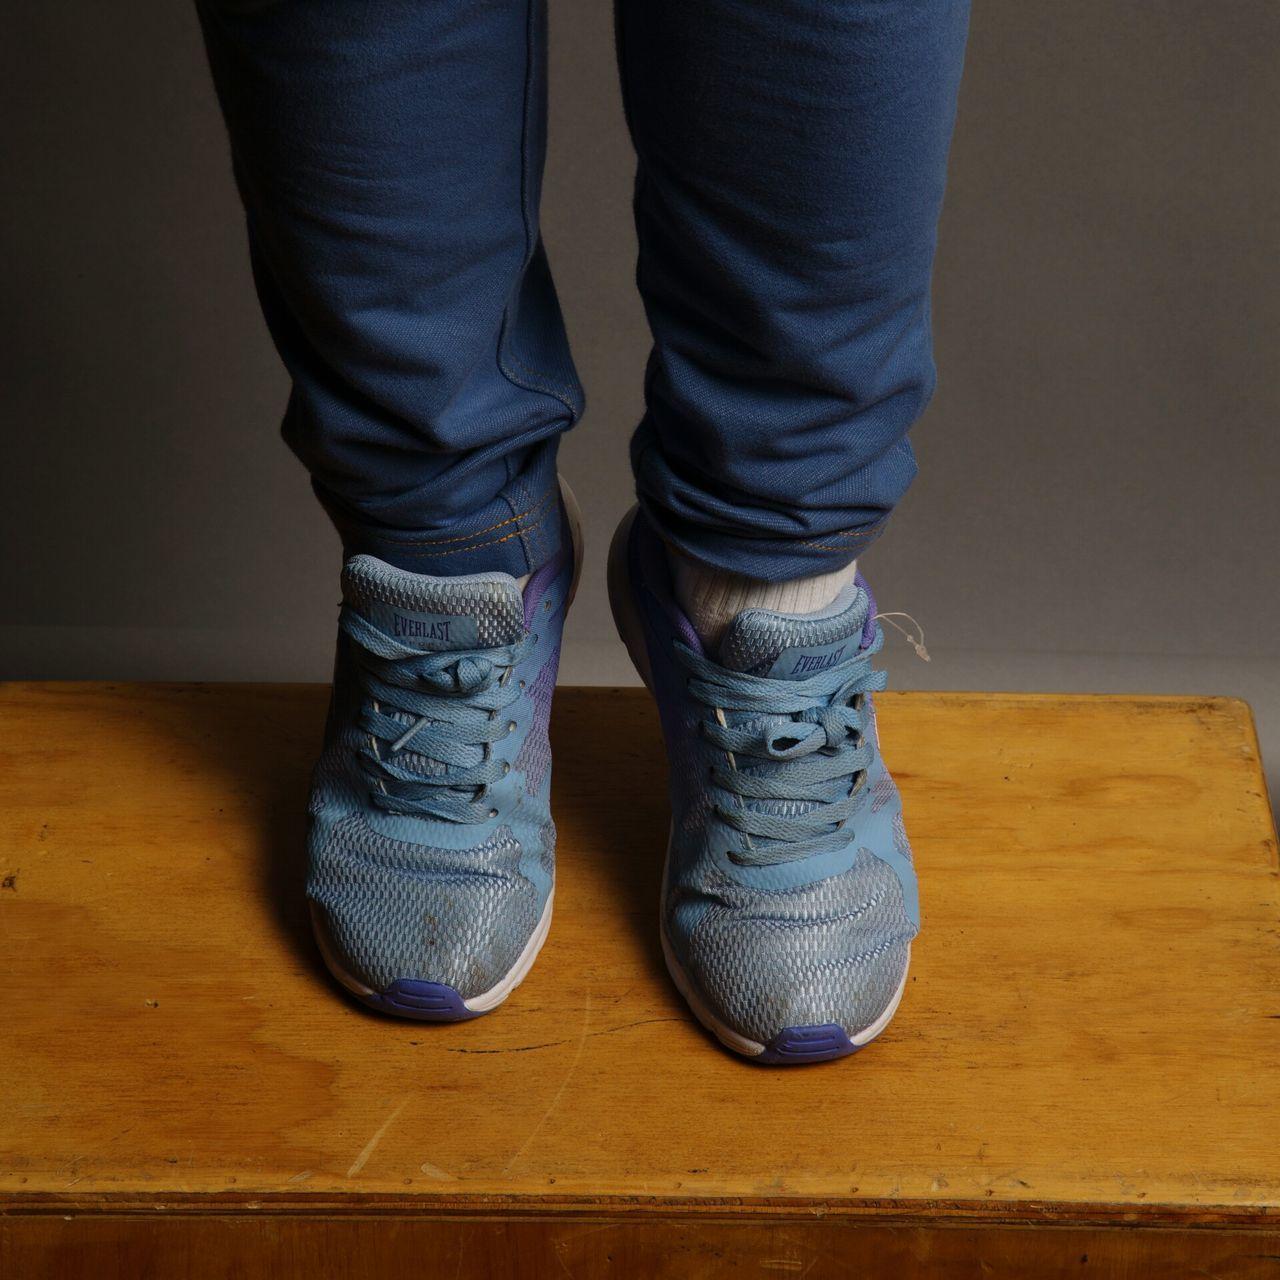 Feet Tippy Toes Studio Shot Box